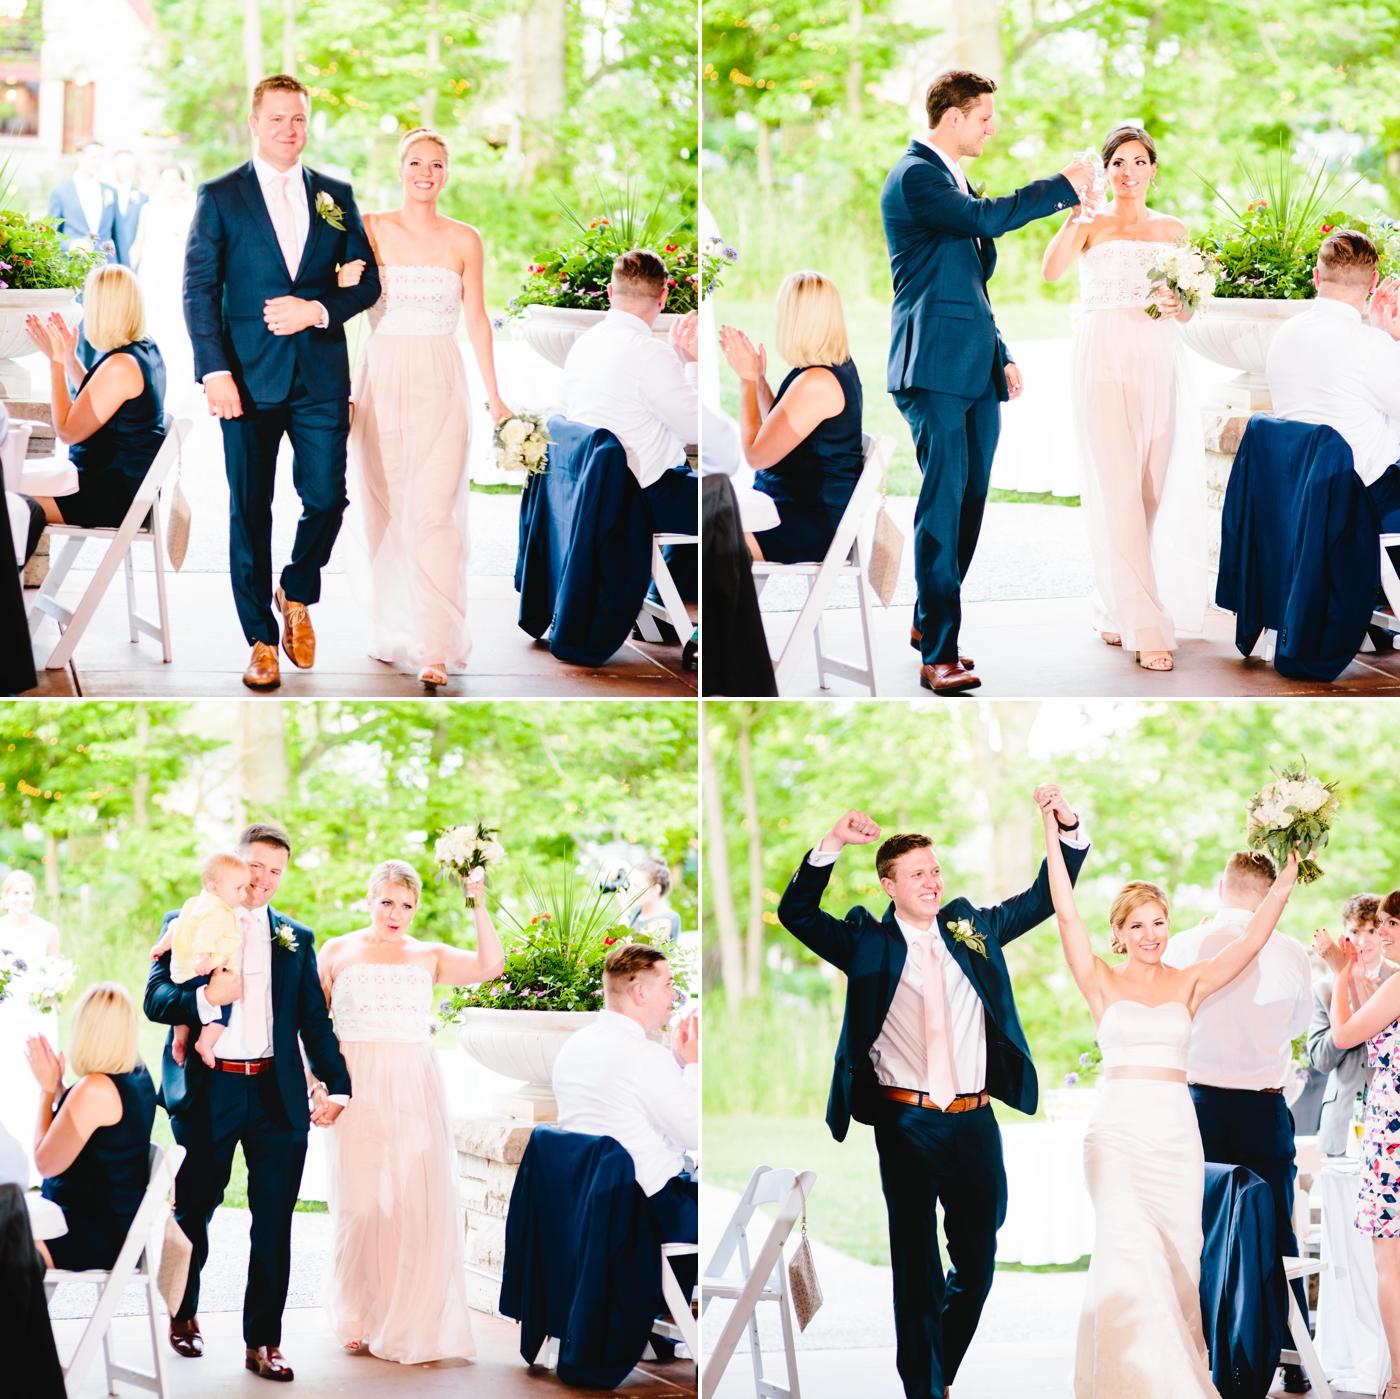 chicago-fine-art-wedding-photography-girod32